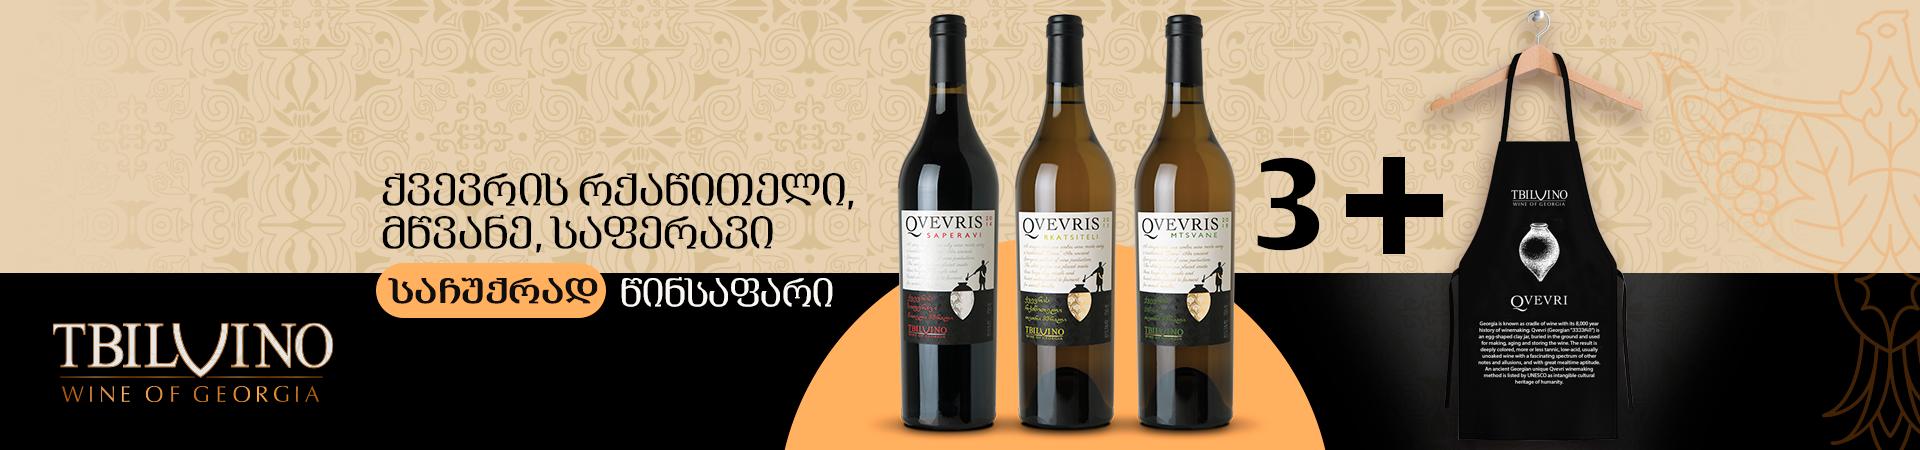 Tbilvino-3-qvevry-wine-+-apron-1920X450-GEO